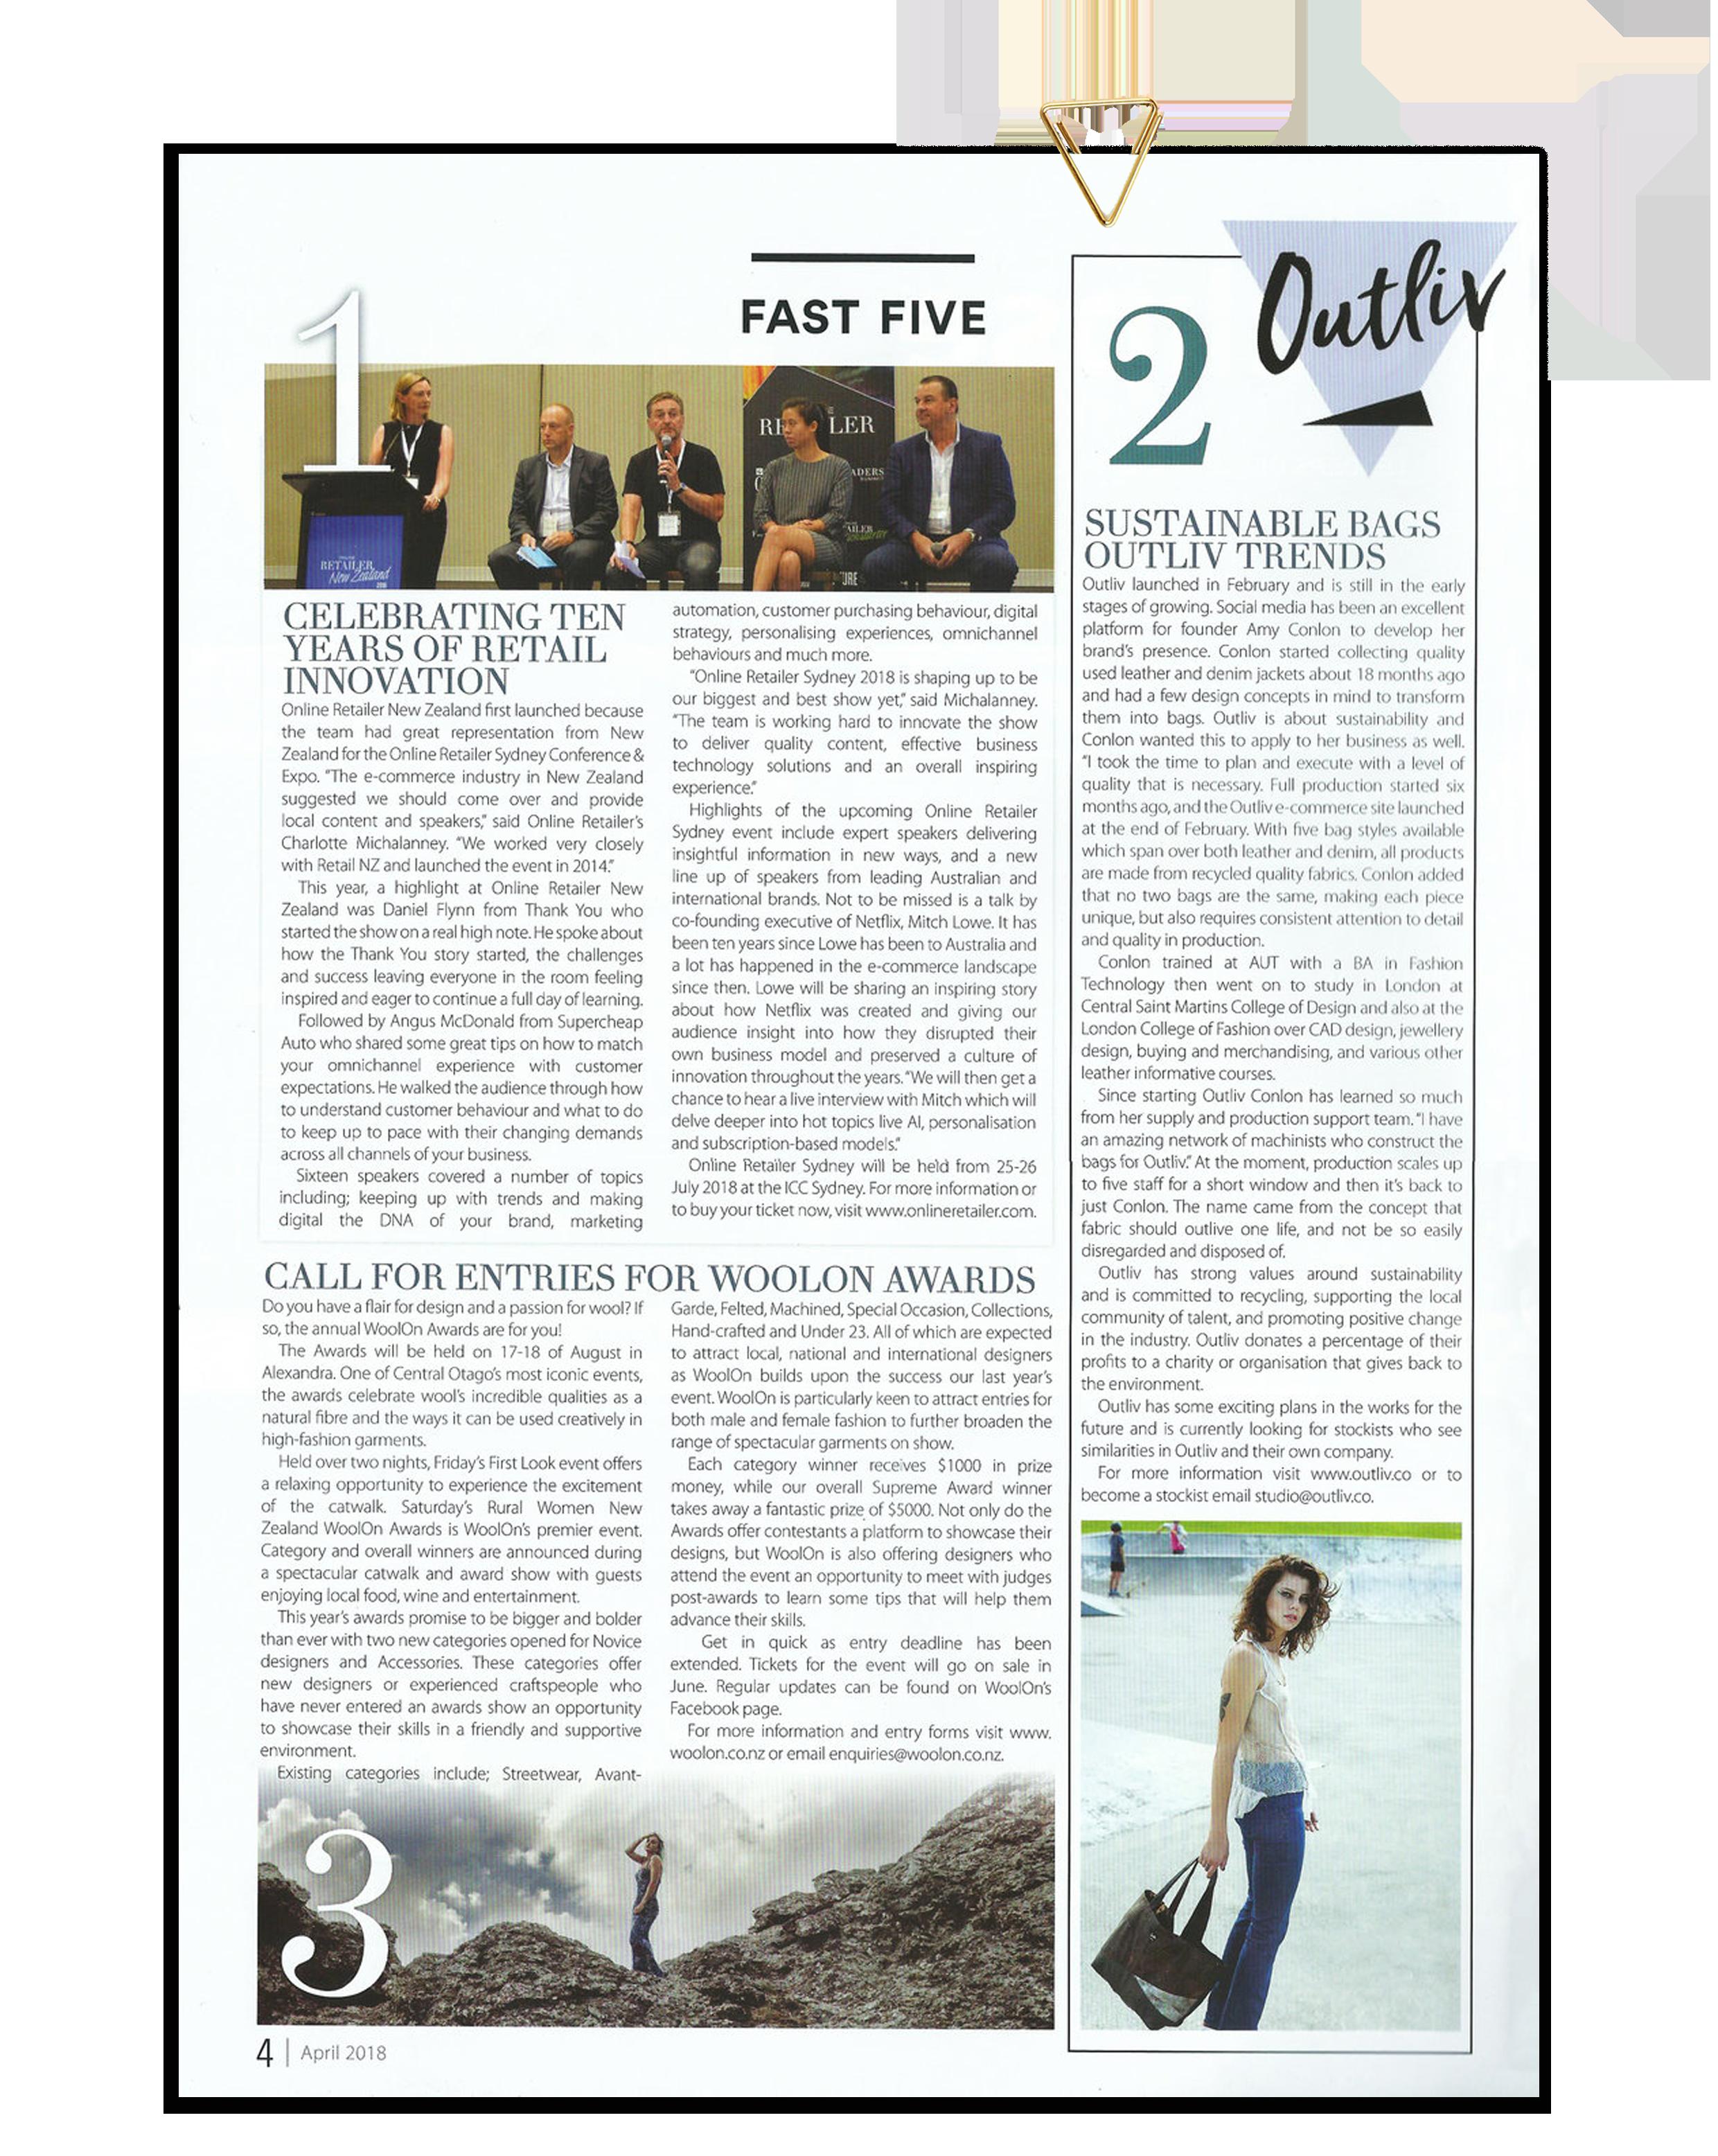 APPAREL MAGAZINE | www.apparelmagazine.co.nz | Print Vol. 51 No 4 | April 2019